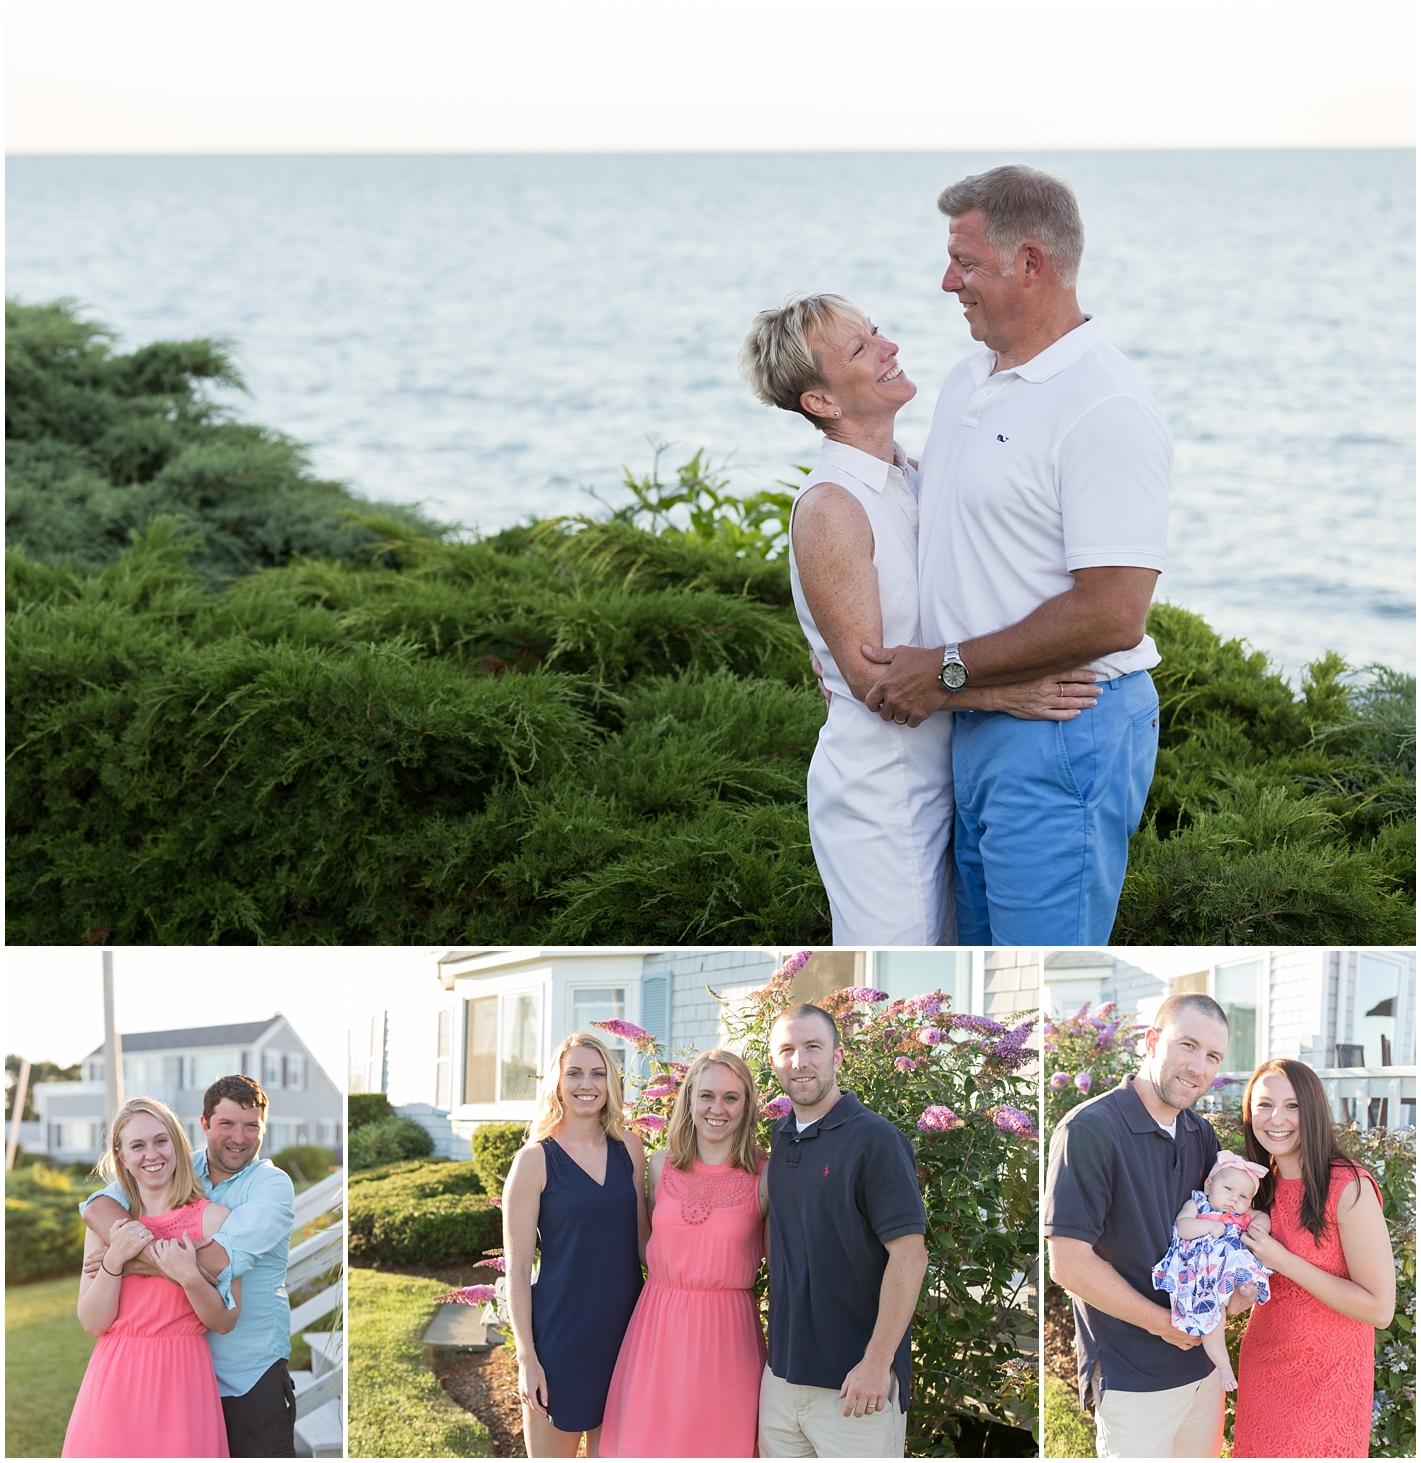 Family photo on Cape Cod, Massachusetts - Popponesset Beach